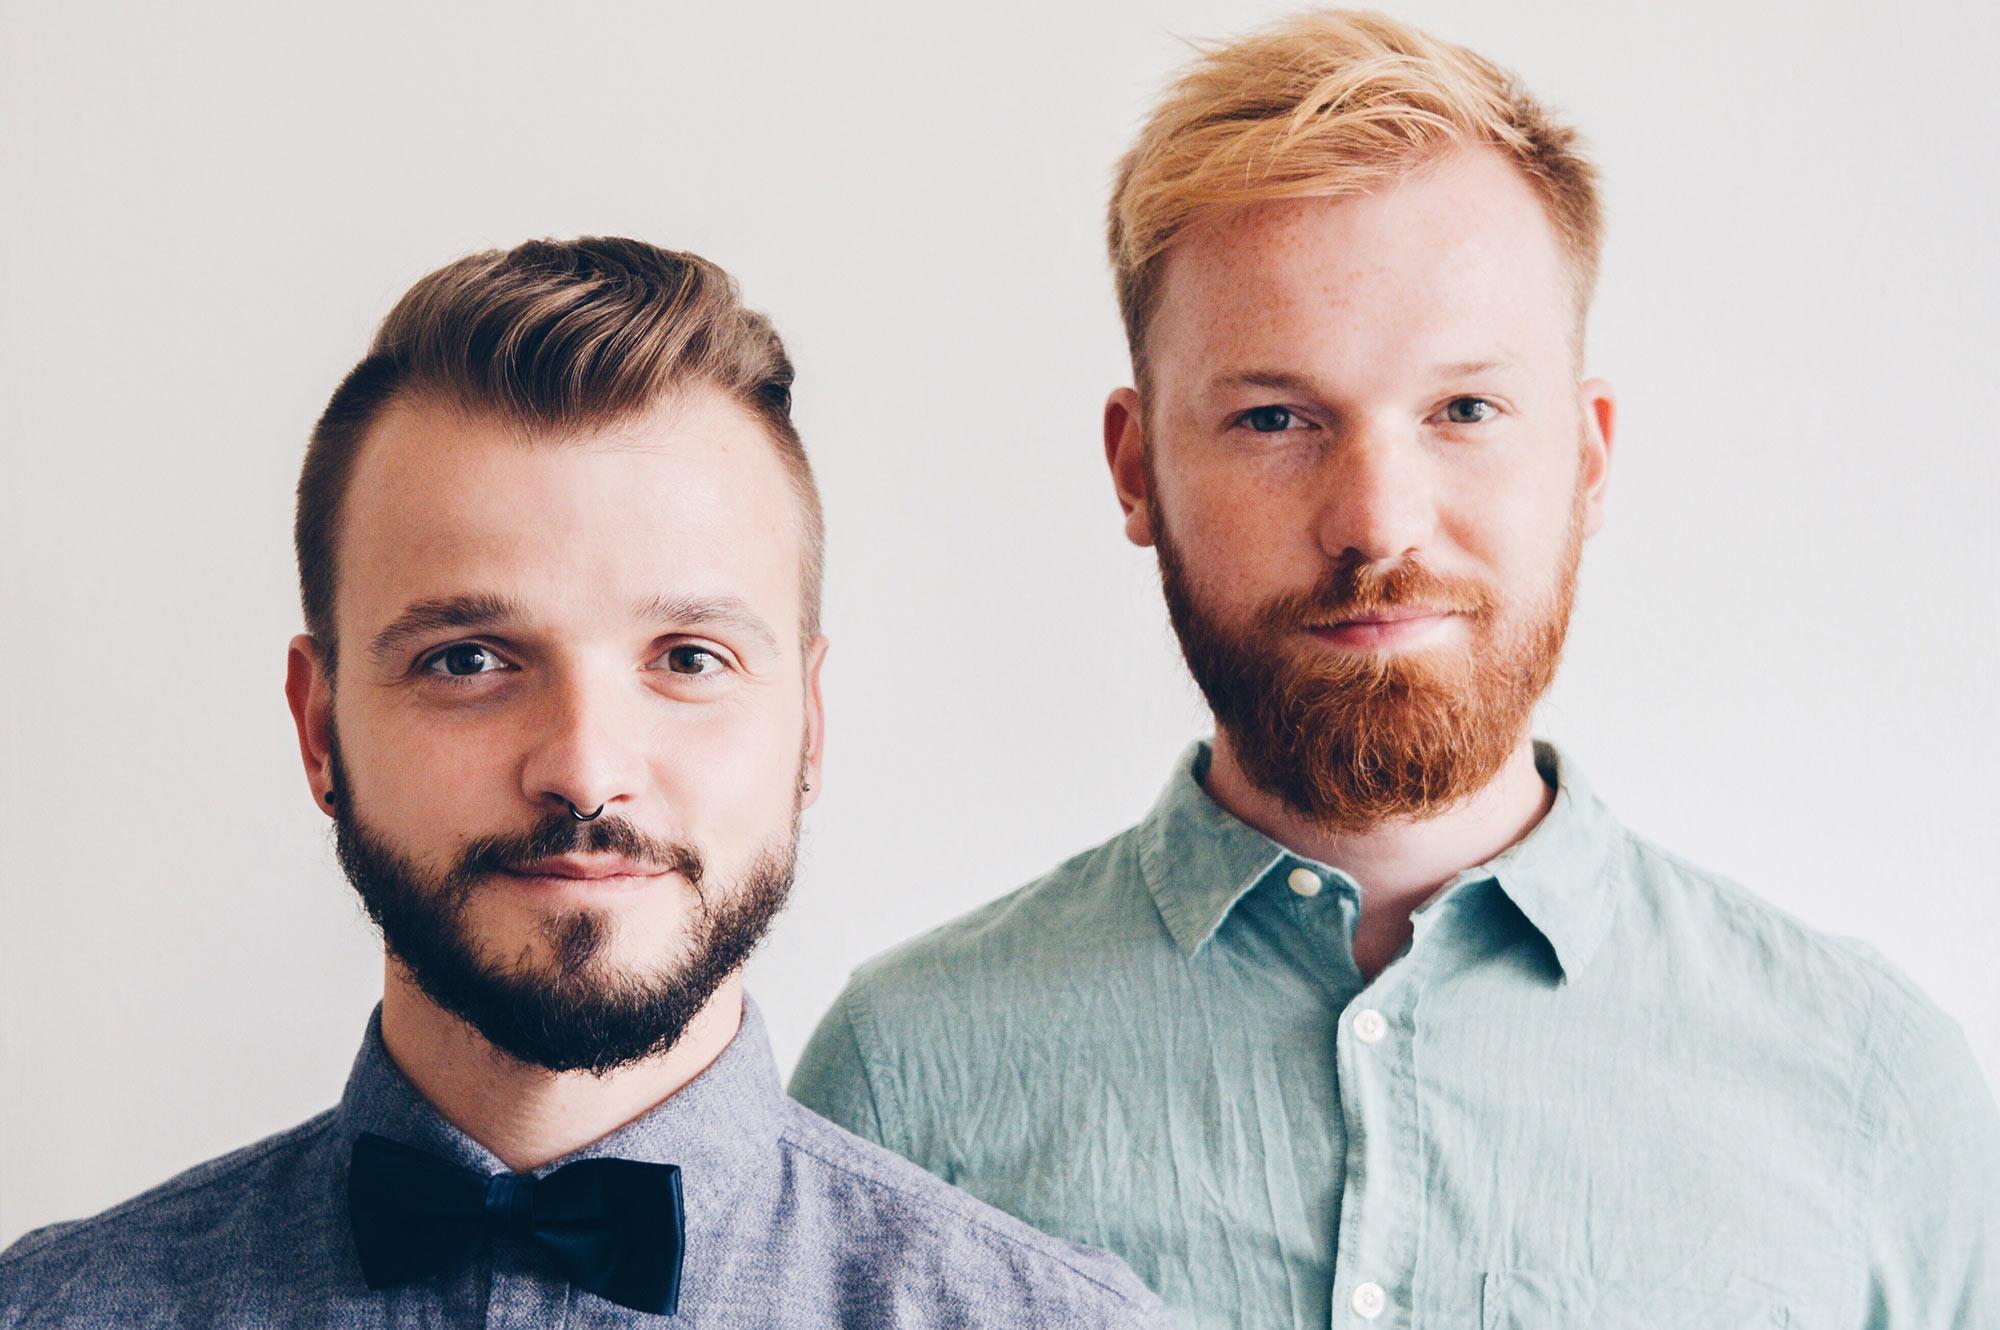 Alles über die Männer von Couple of Men - Der Gay Reiseblog About Couple of Men Gay Travel Blog © CoupleofMen.com